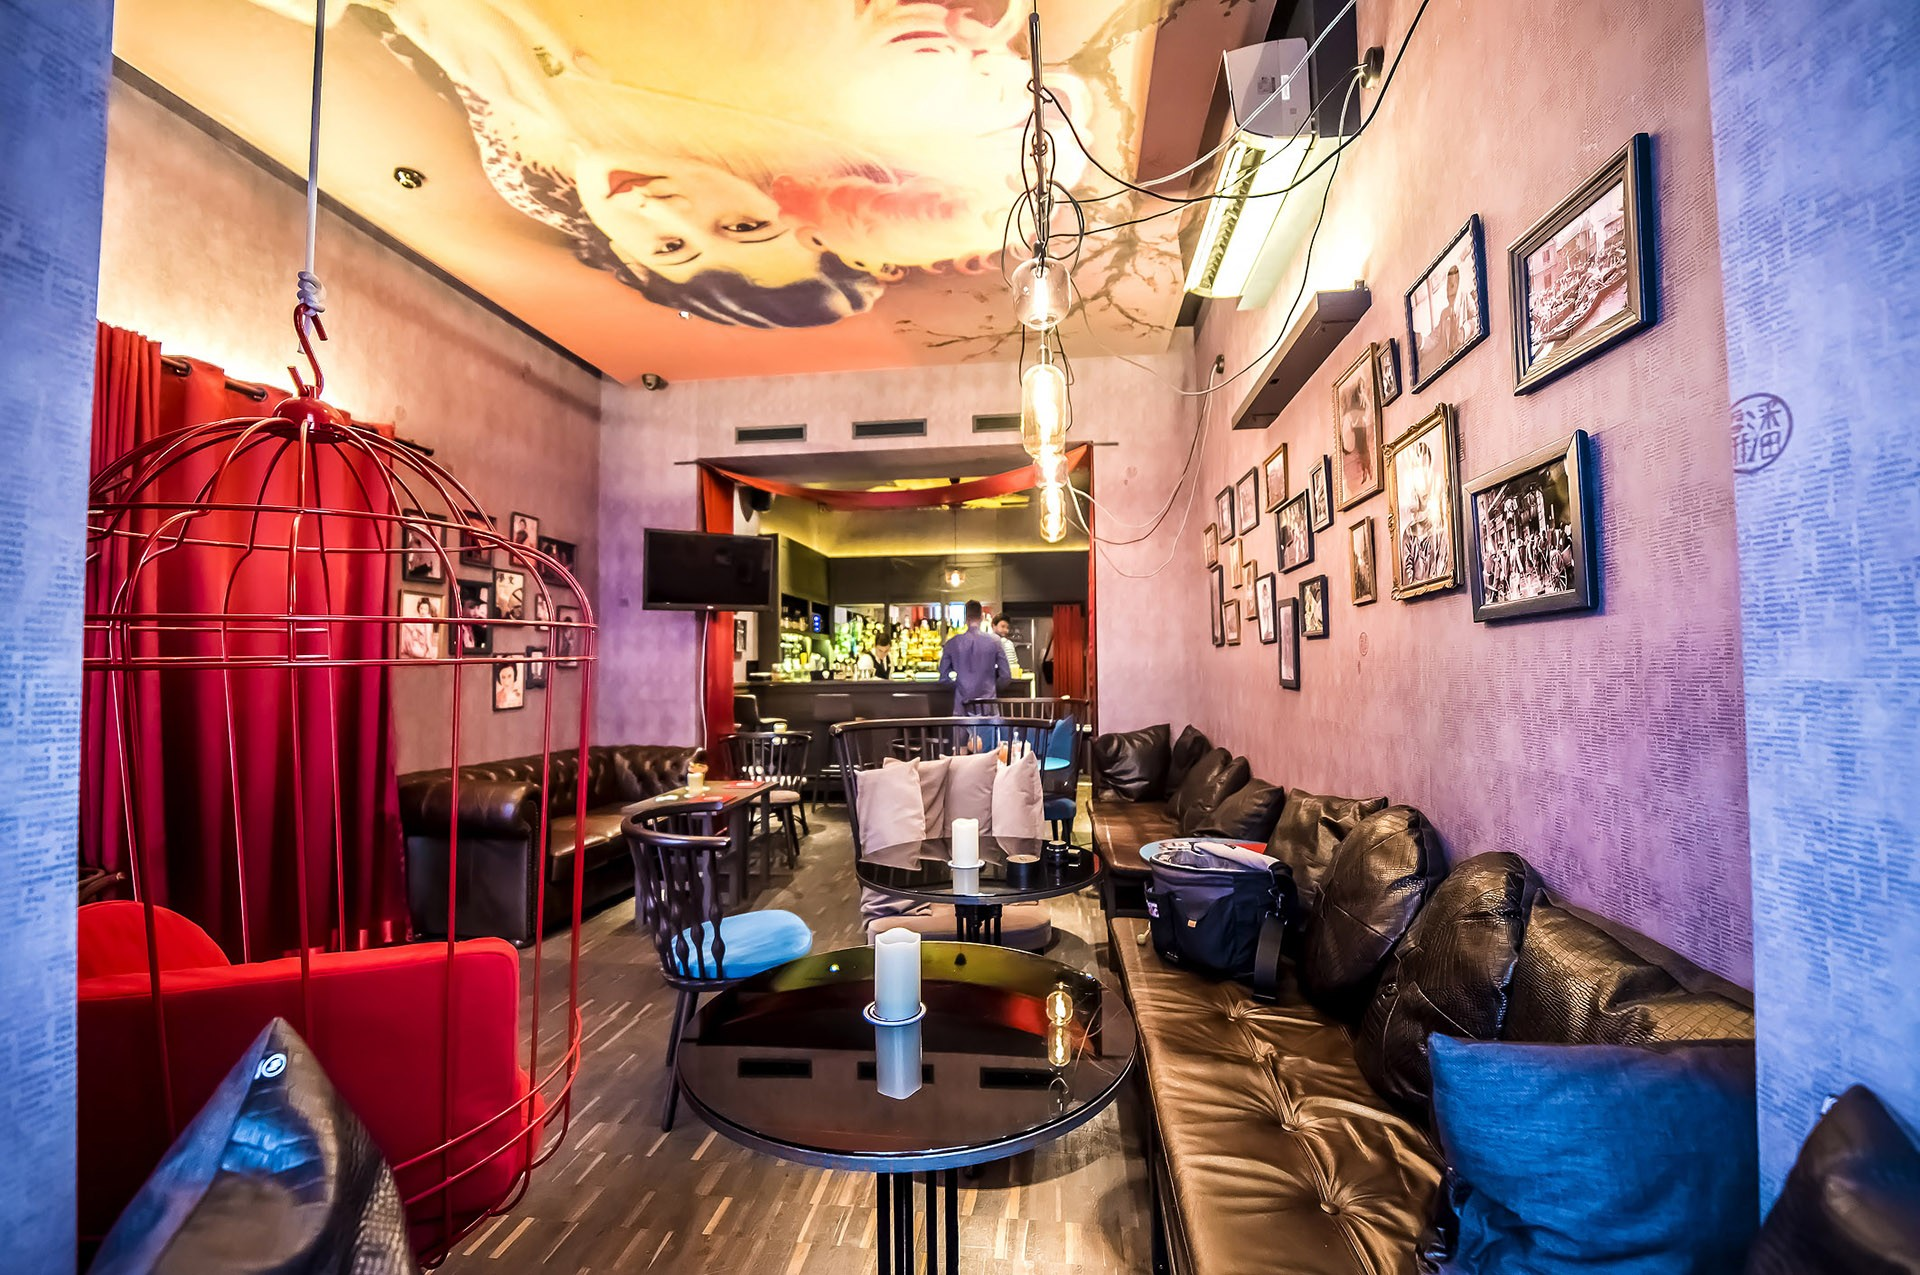 Finest-Cocktail-Budapest-Tuk-Tuk-Bar-Casati-Budapest-Hotel